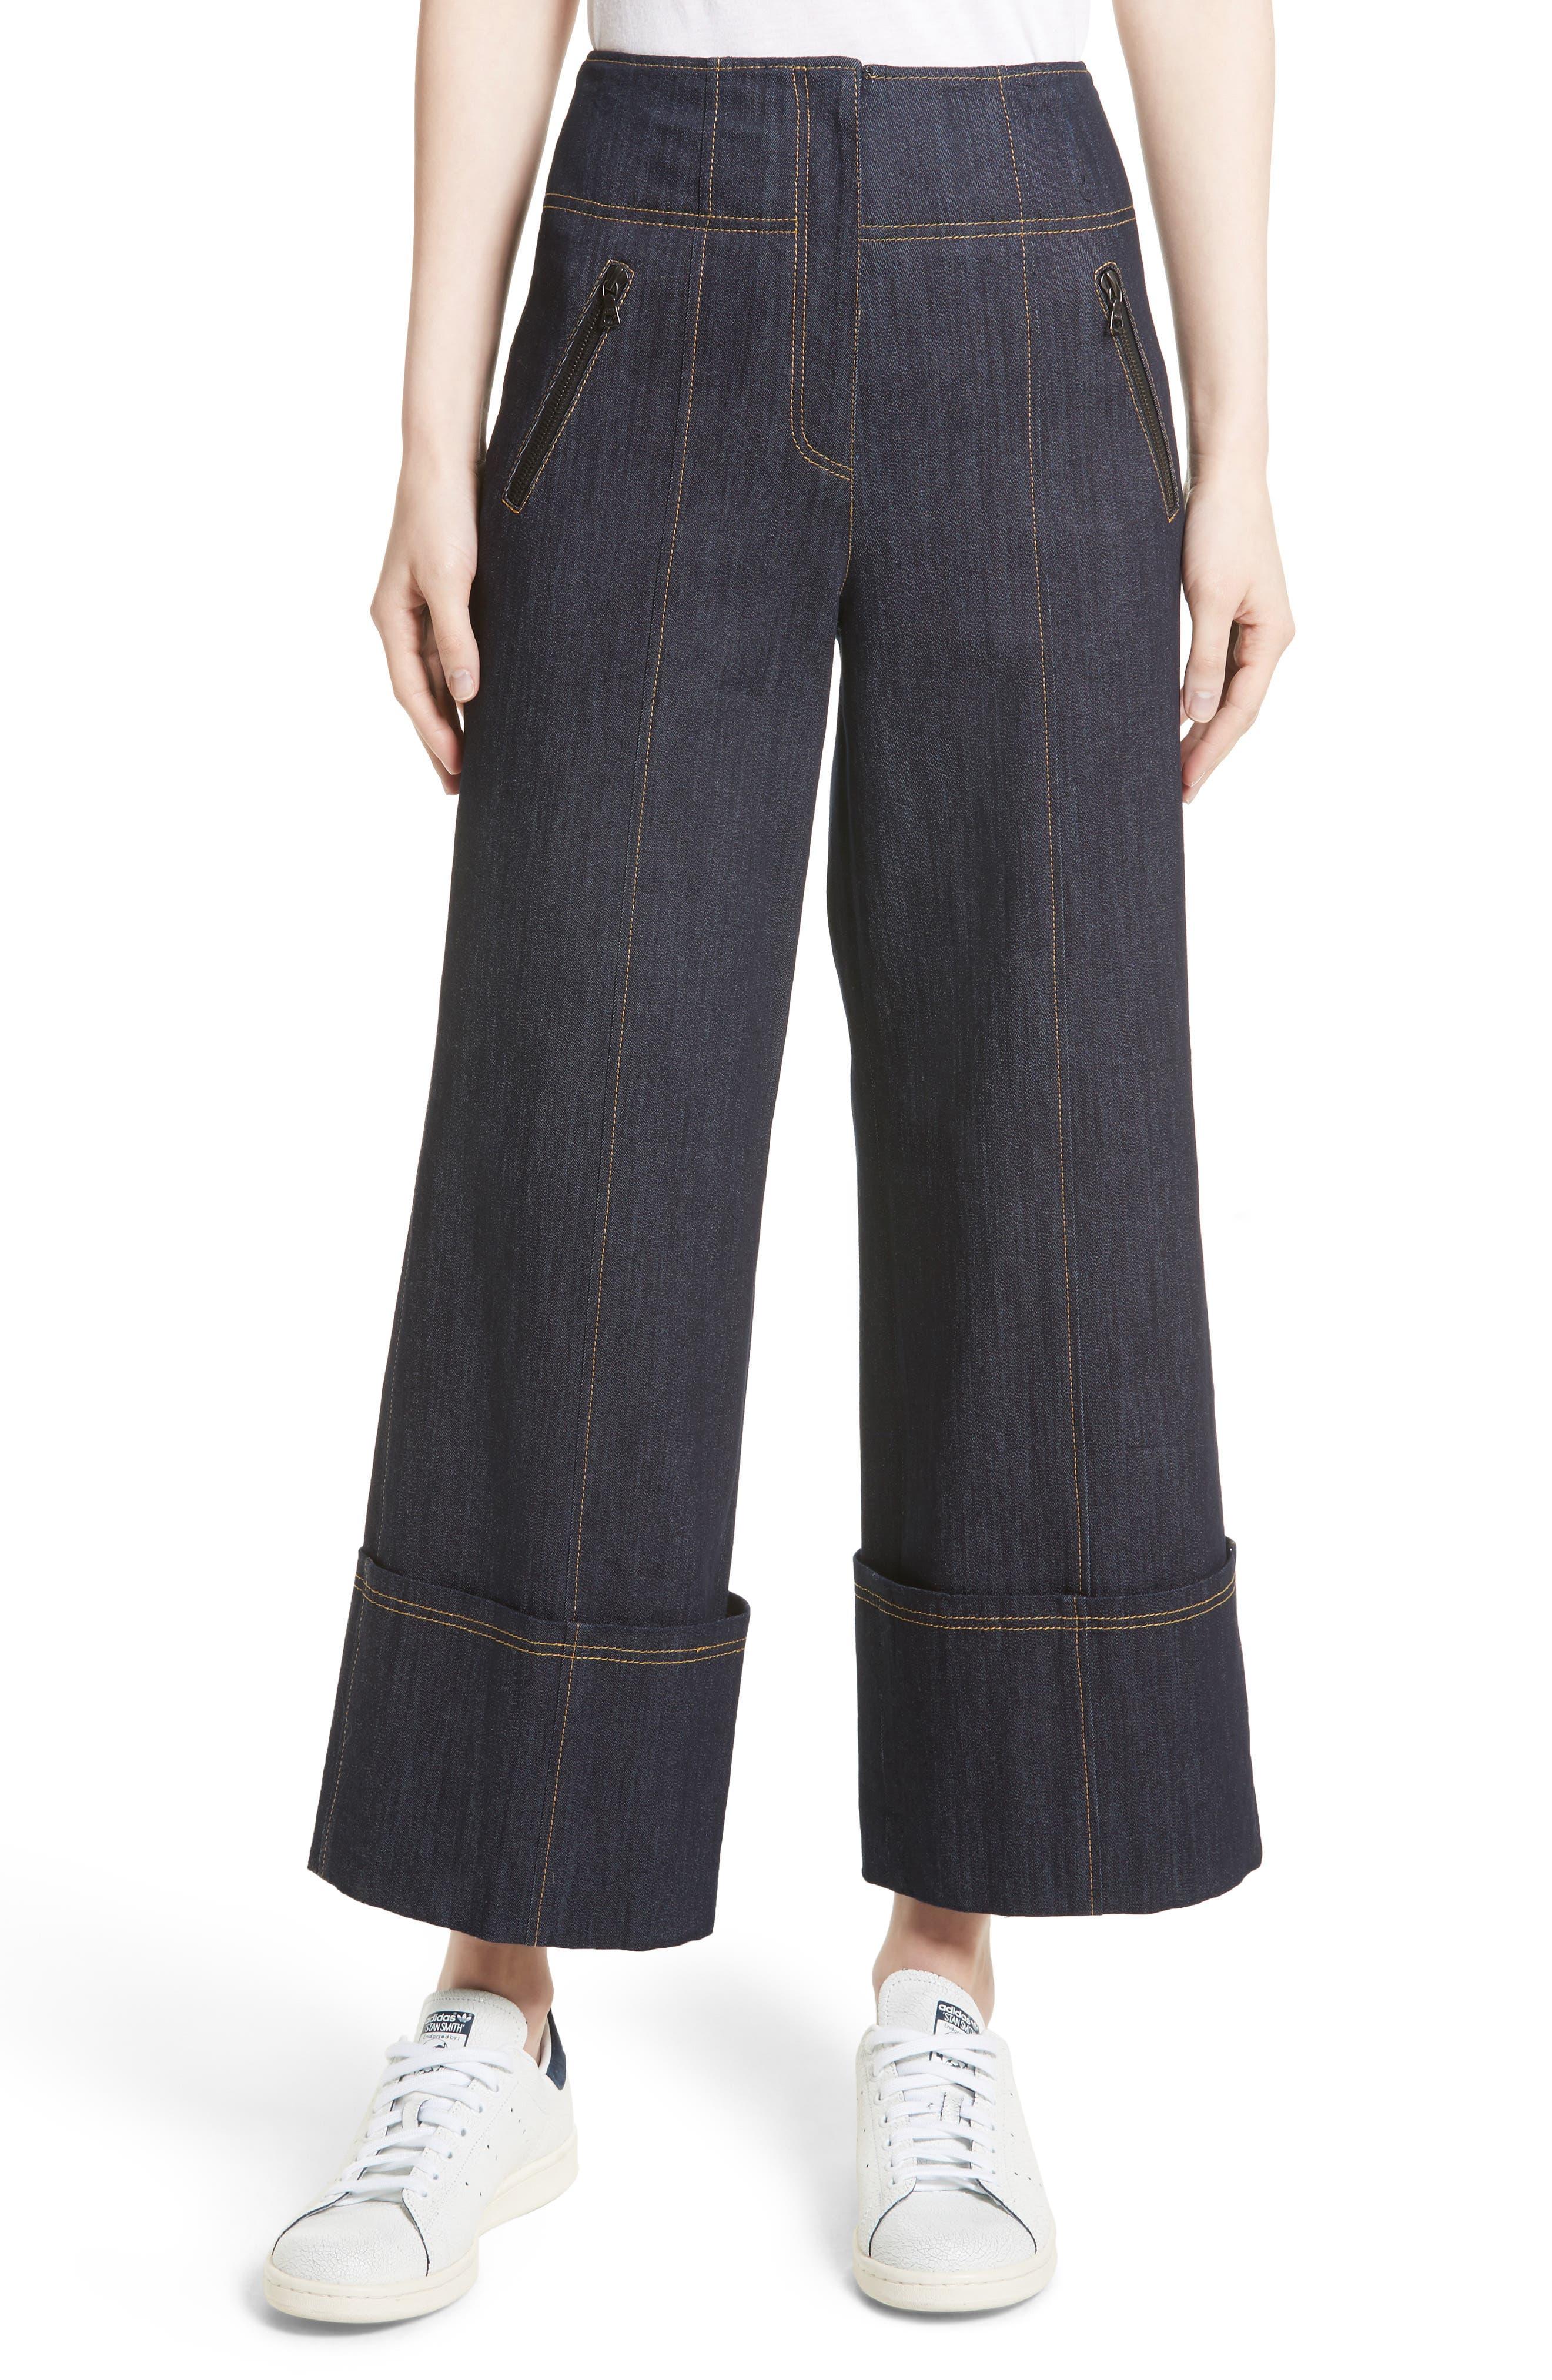 Alternate Image 1 Selected - Cinq à Sept Marla Cuff Jeans